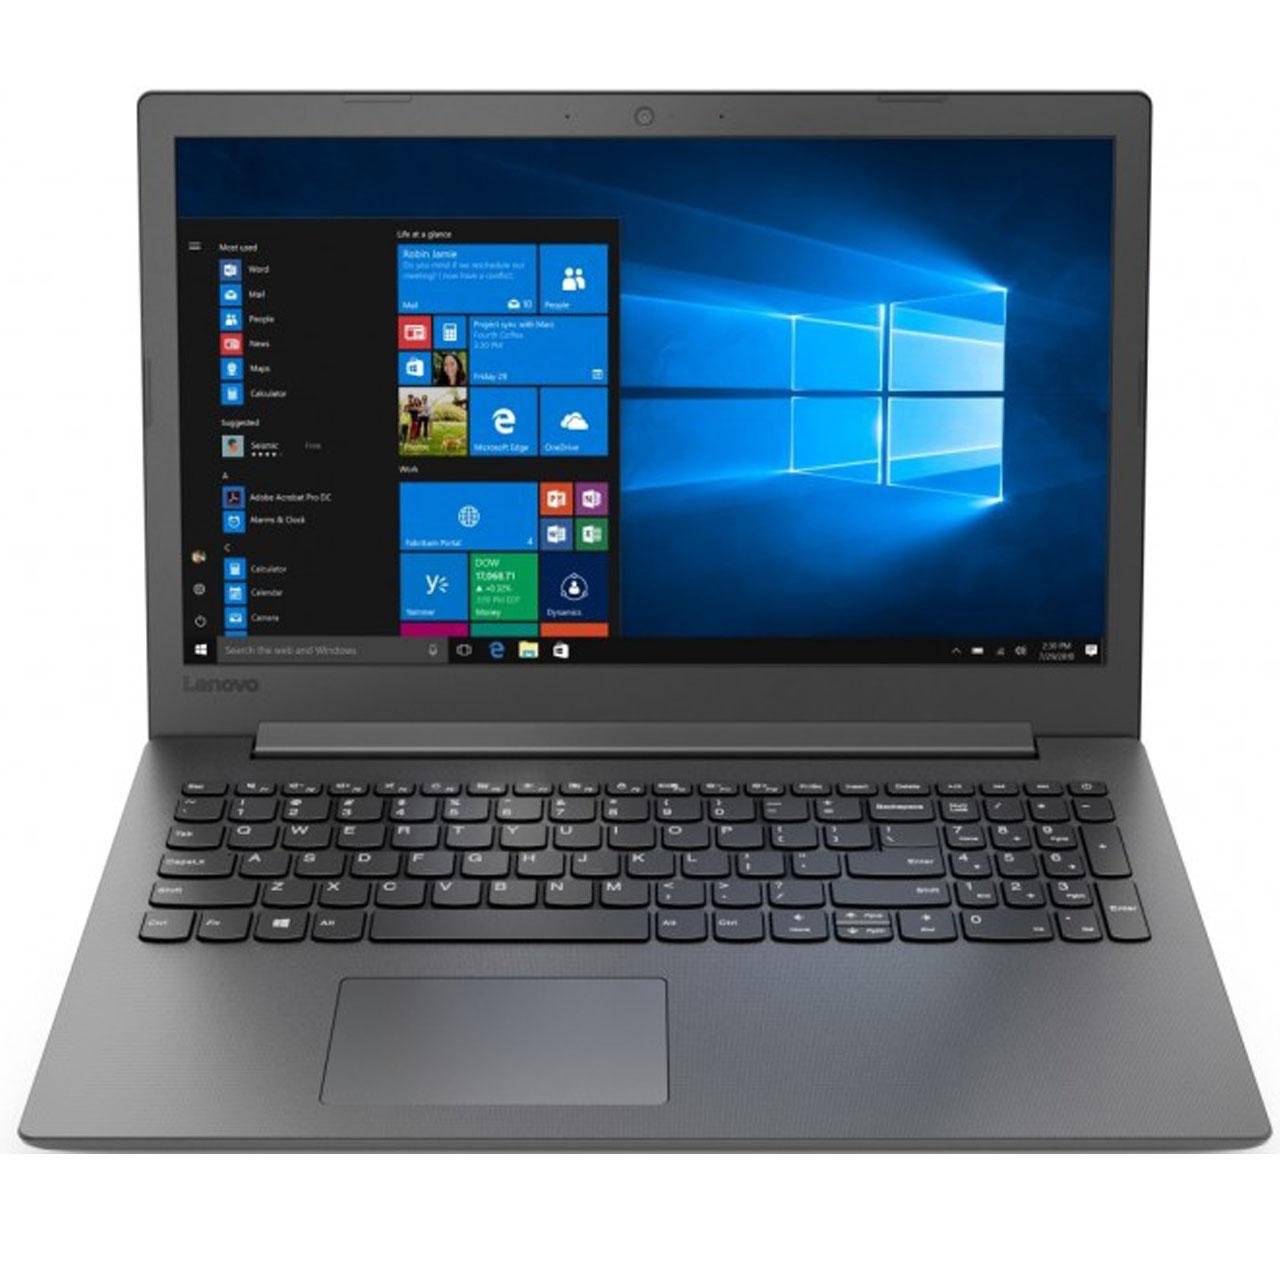 لپ تاپ 15 اینچی لنوو مدل Ideapad 130 - AMC